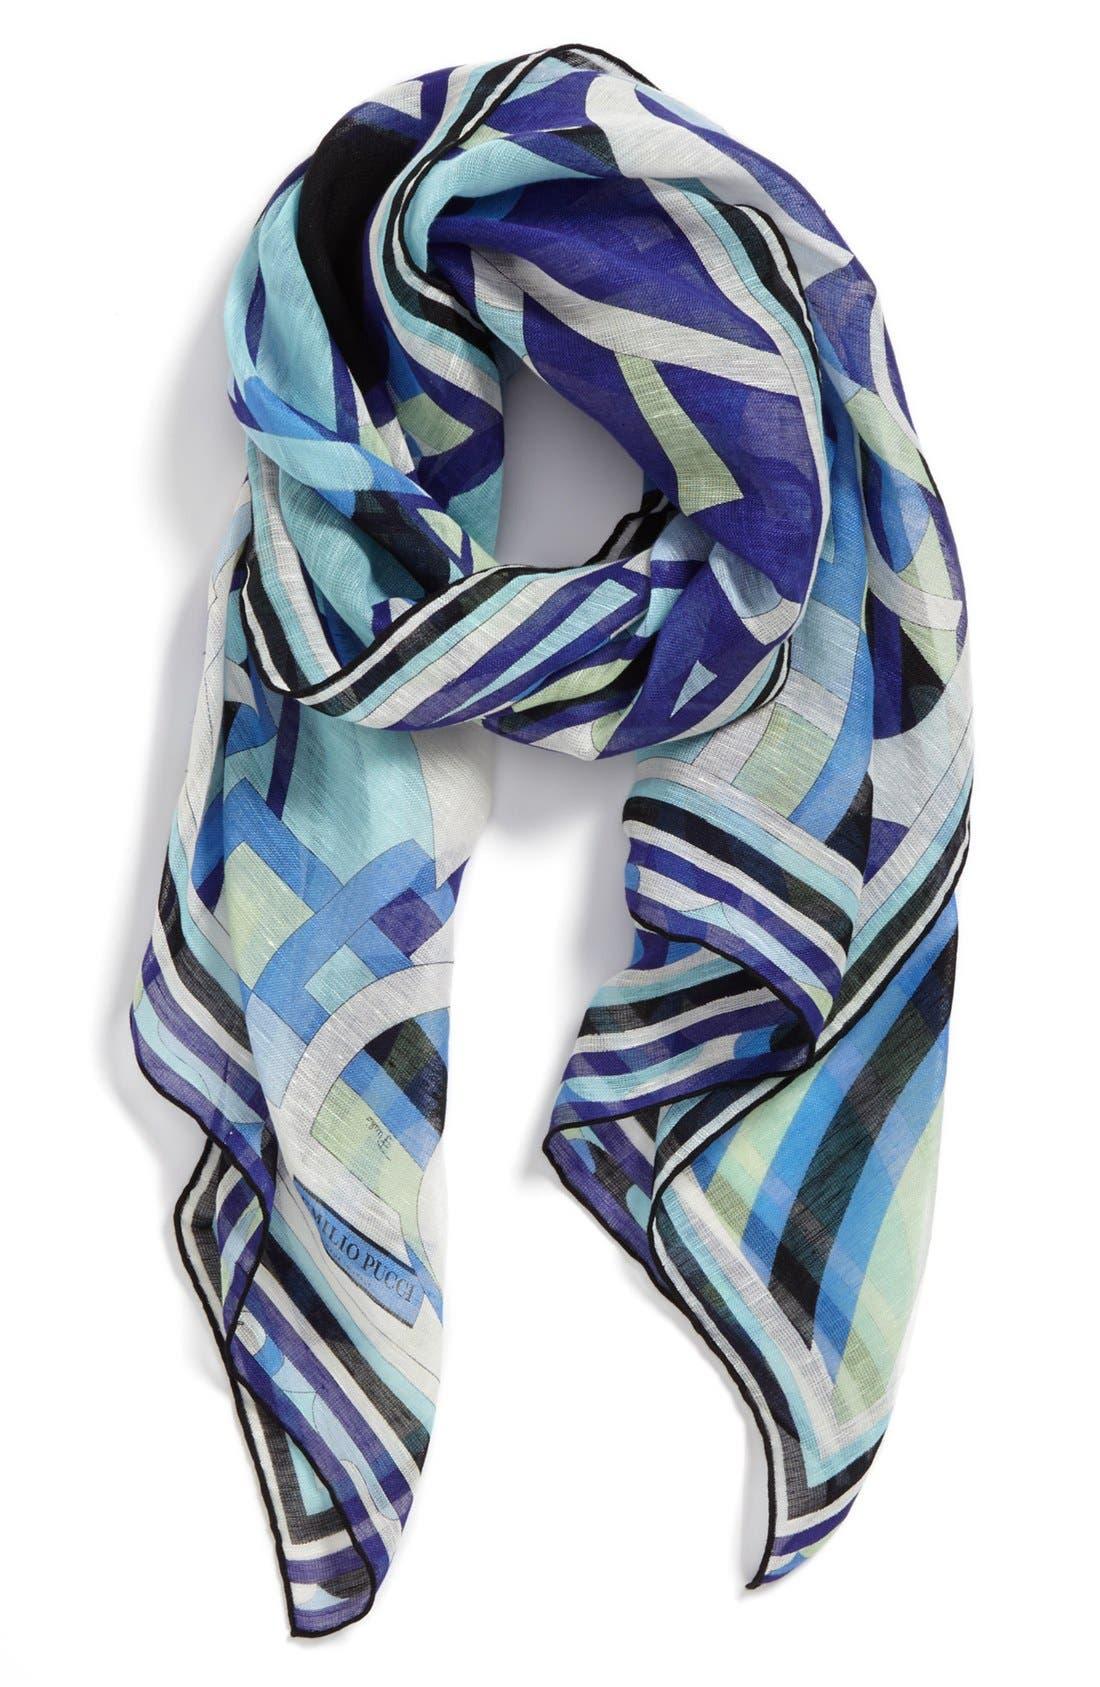 Alternate Image 1 Selected - Emilio Pucci 'Capri' Linen & Cotton Scarf